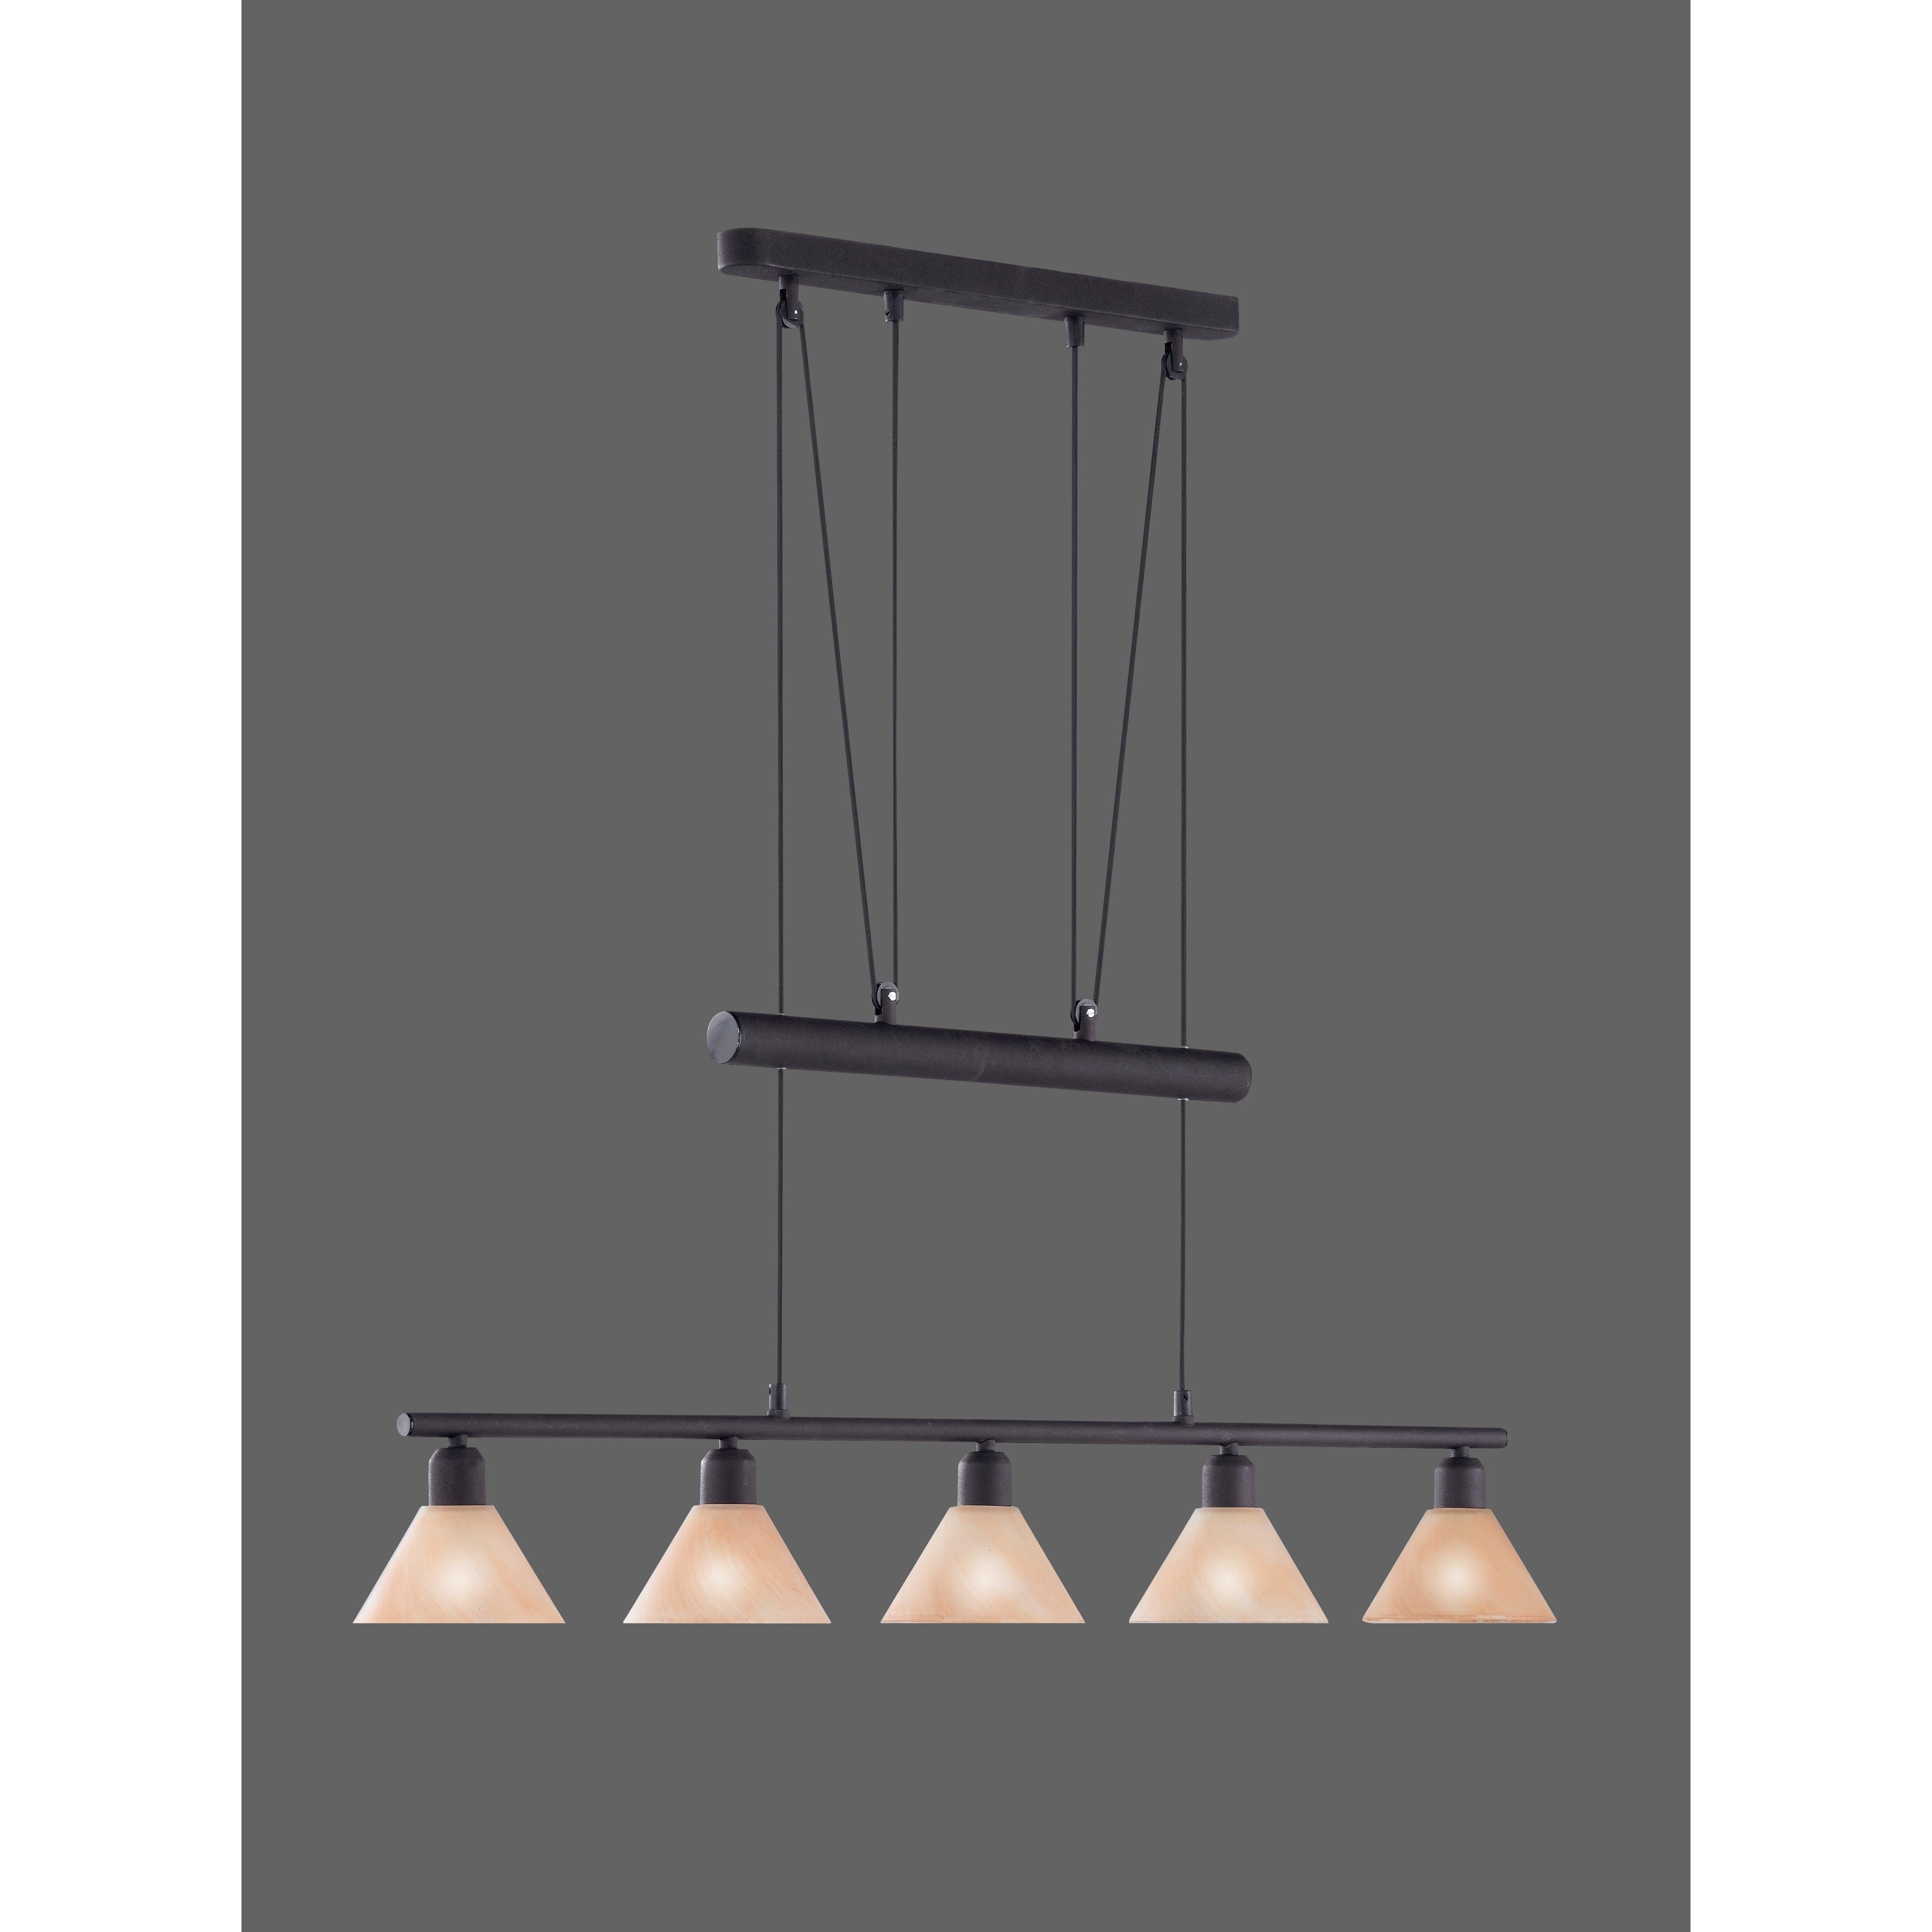 mini pendelleuchte 5 flammig von trio. Black Bedroom Furniture Sets. Home Design Ideas